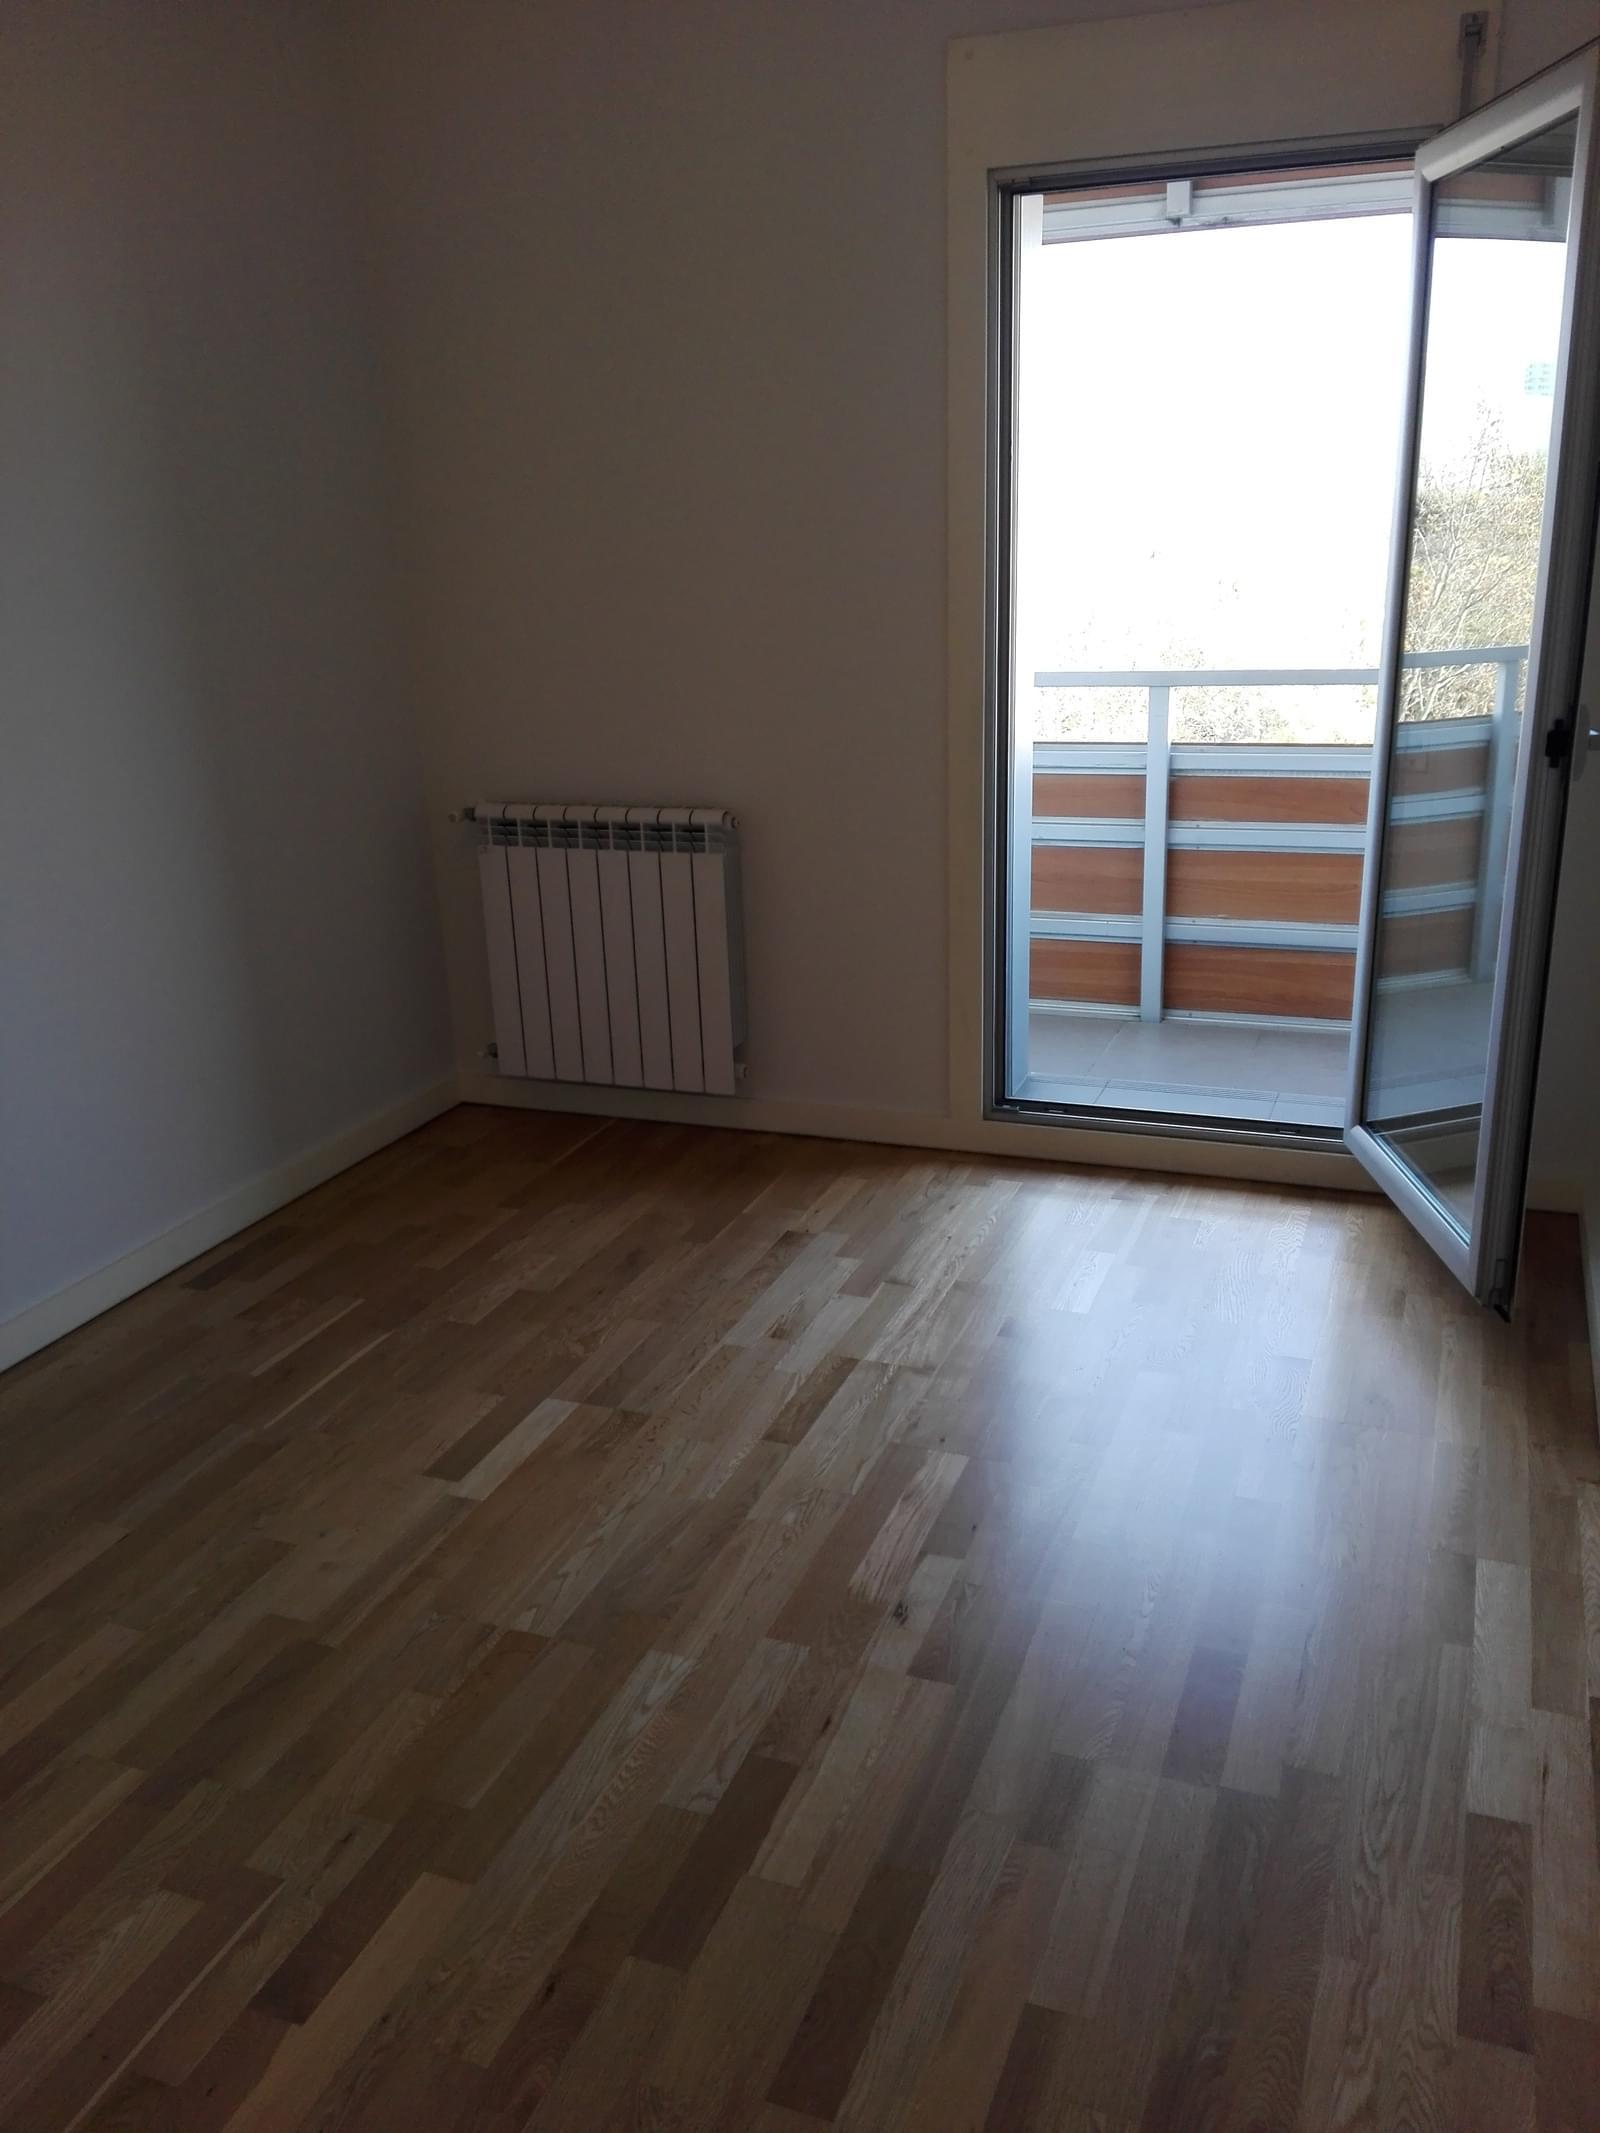 pf18814-apartamento-t2-lisboa-69dd9c75-46bf-4f31-97f5-5f7cf5ab8f4a